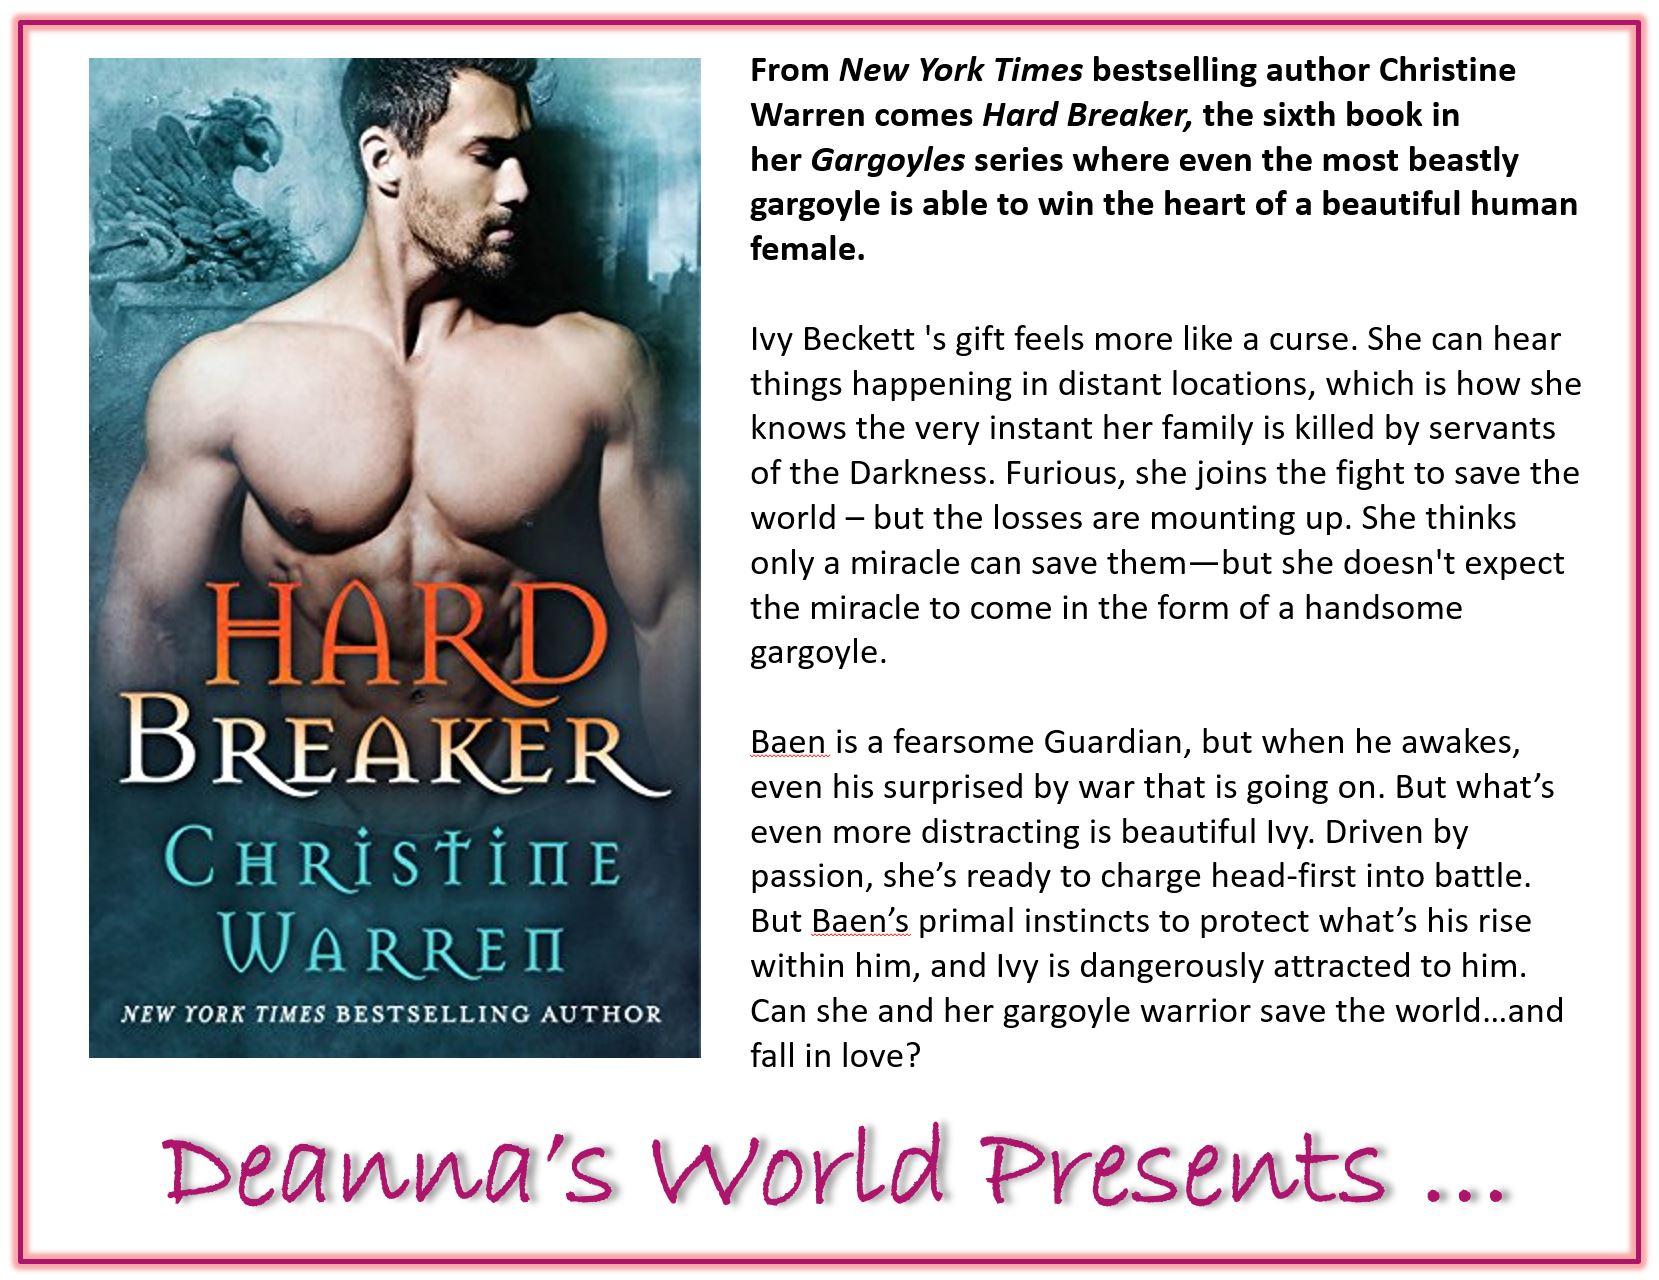 Hard Breaker by Christine Warren blurb